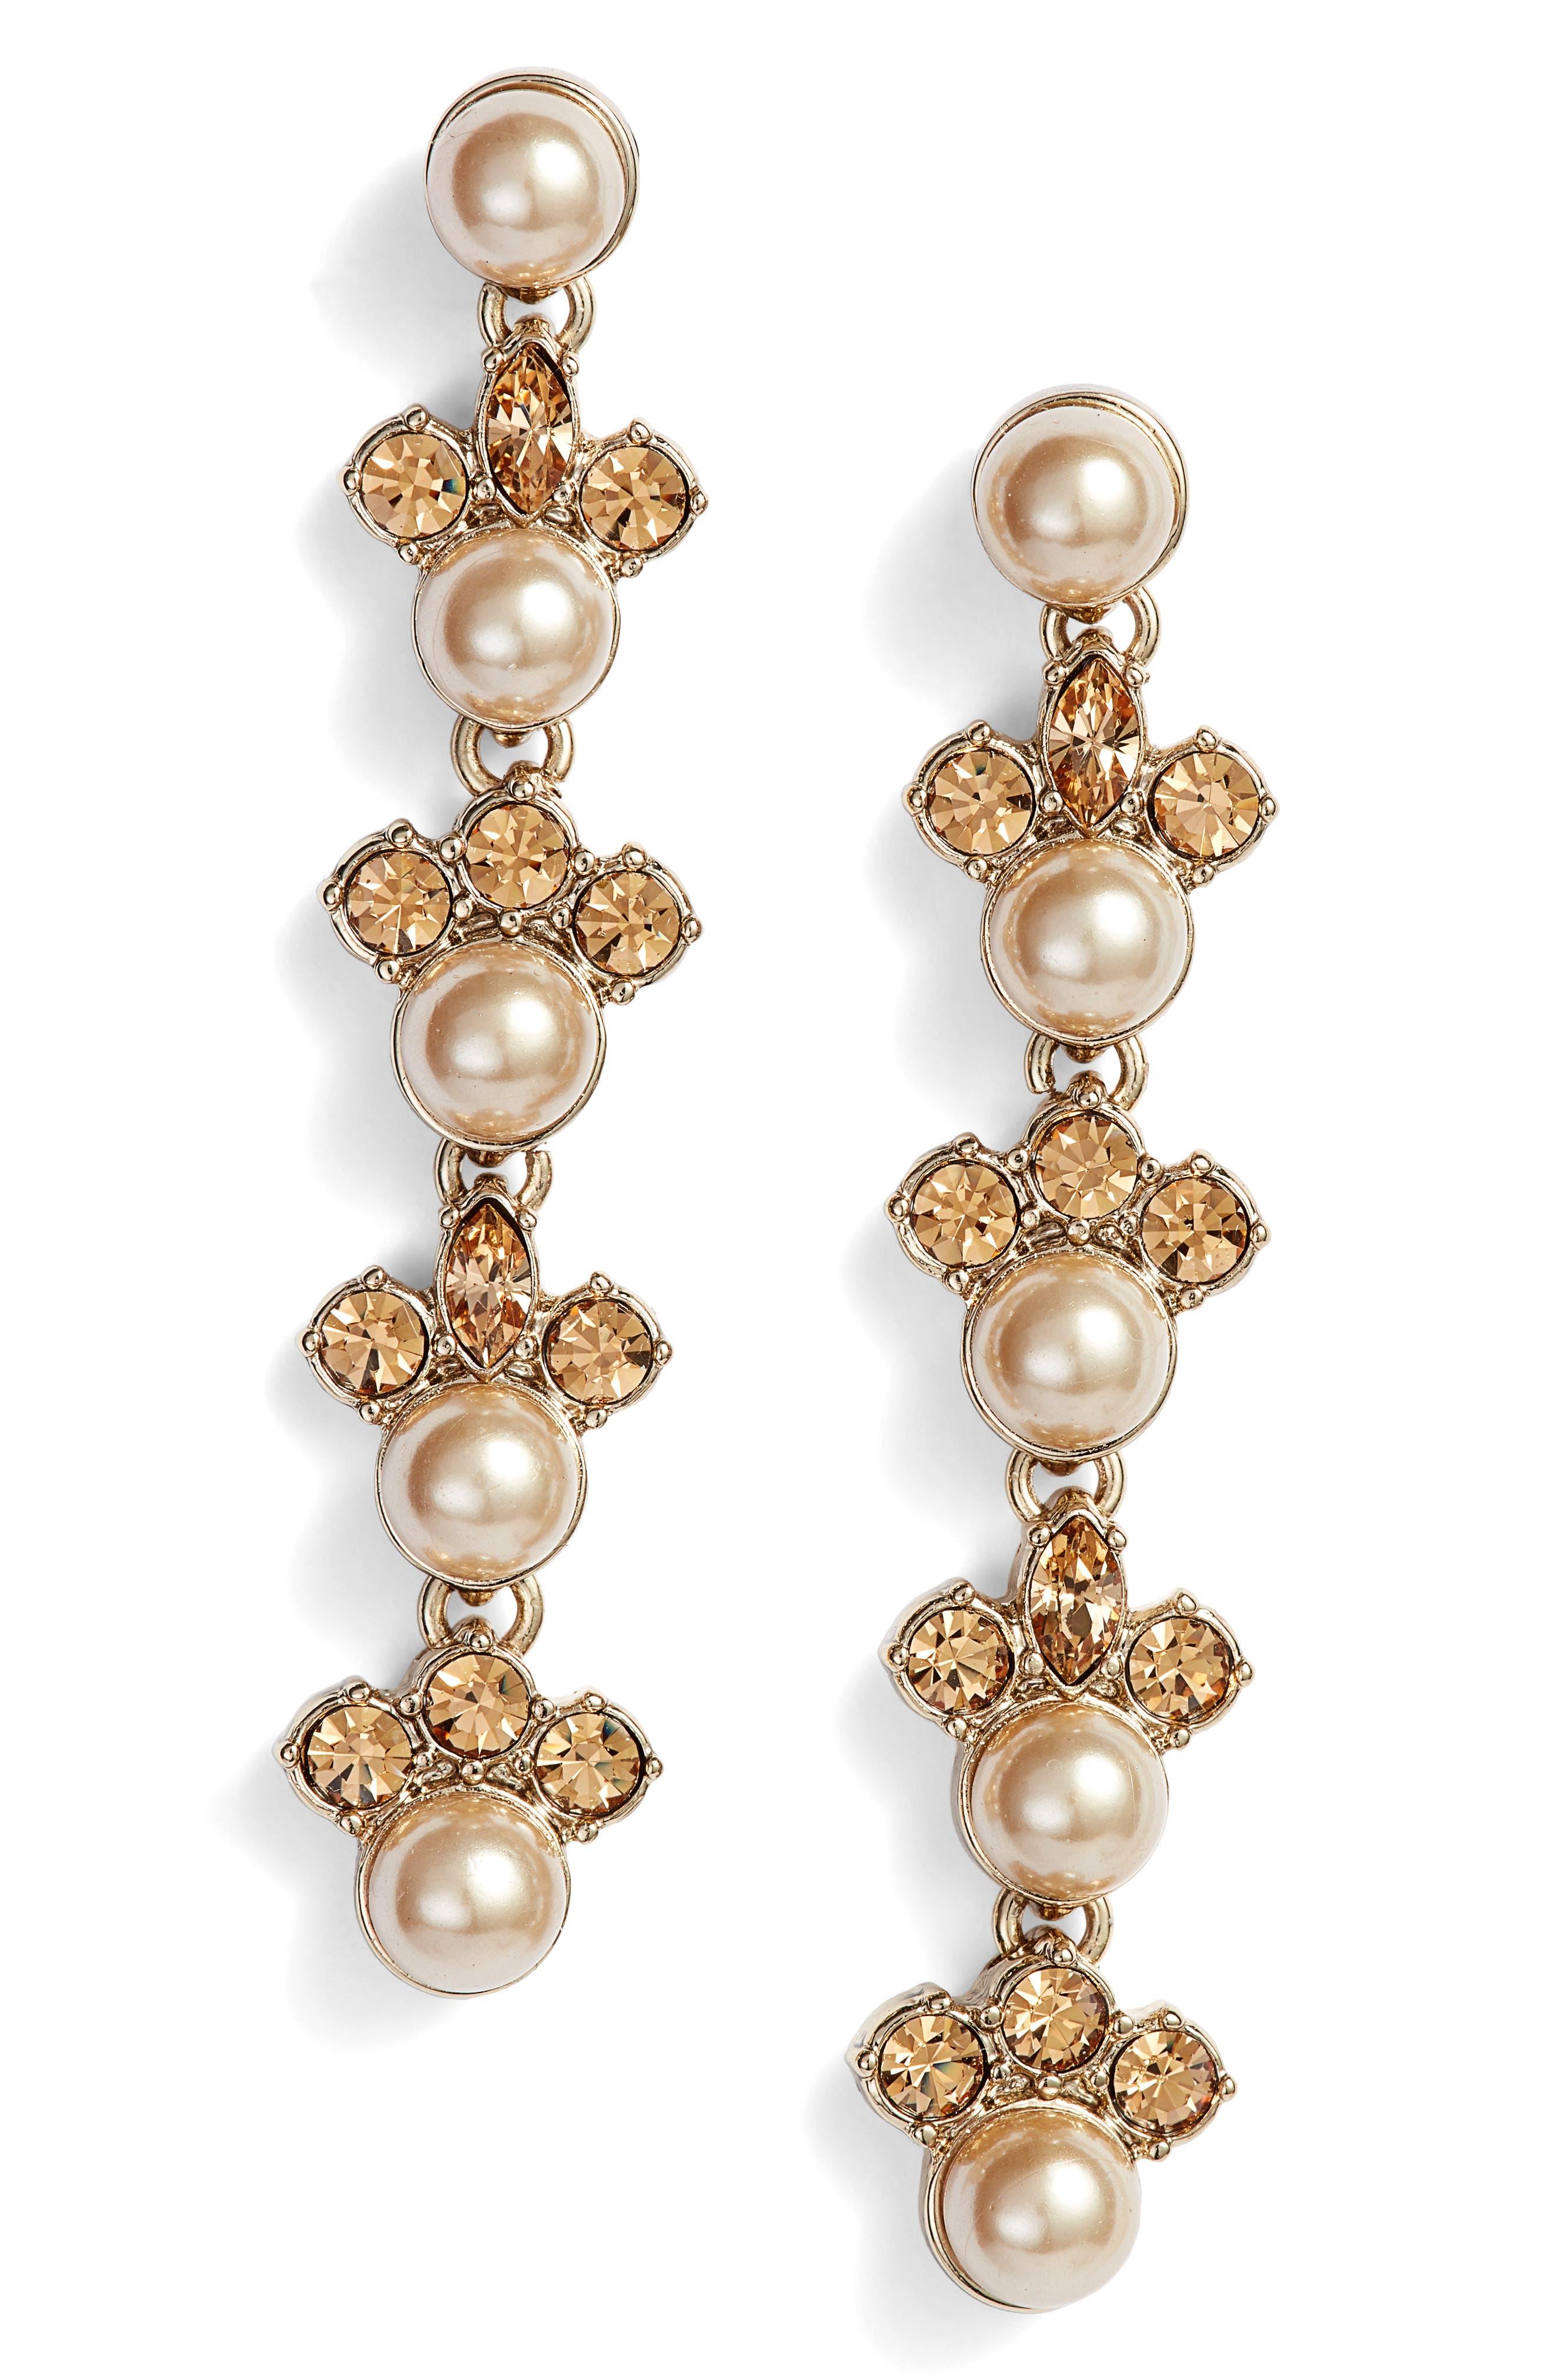 Linear Imitation Pearl Drop Earrings,                         Main,                         color, Gold/ Blush/ Crystal